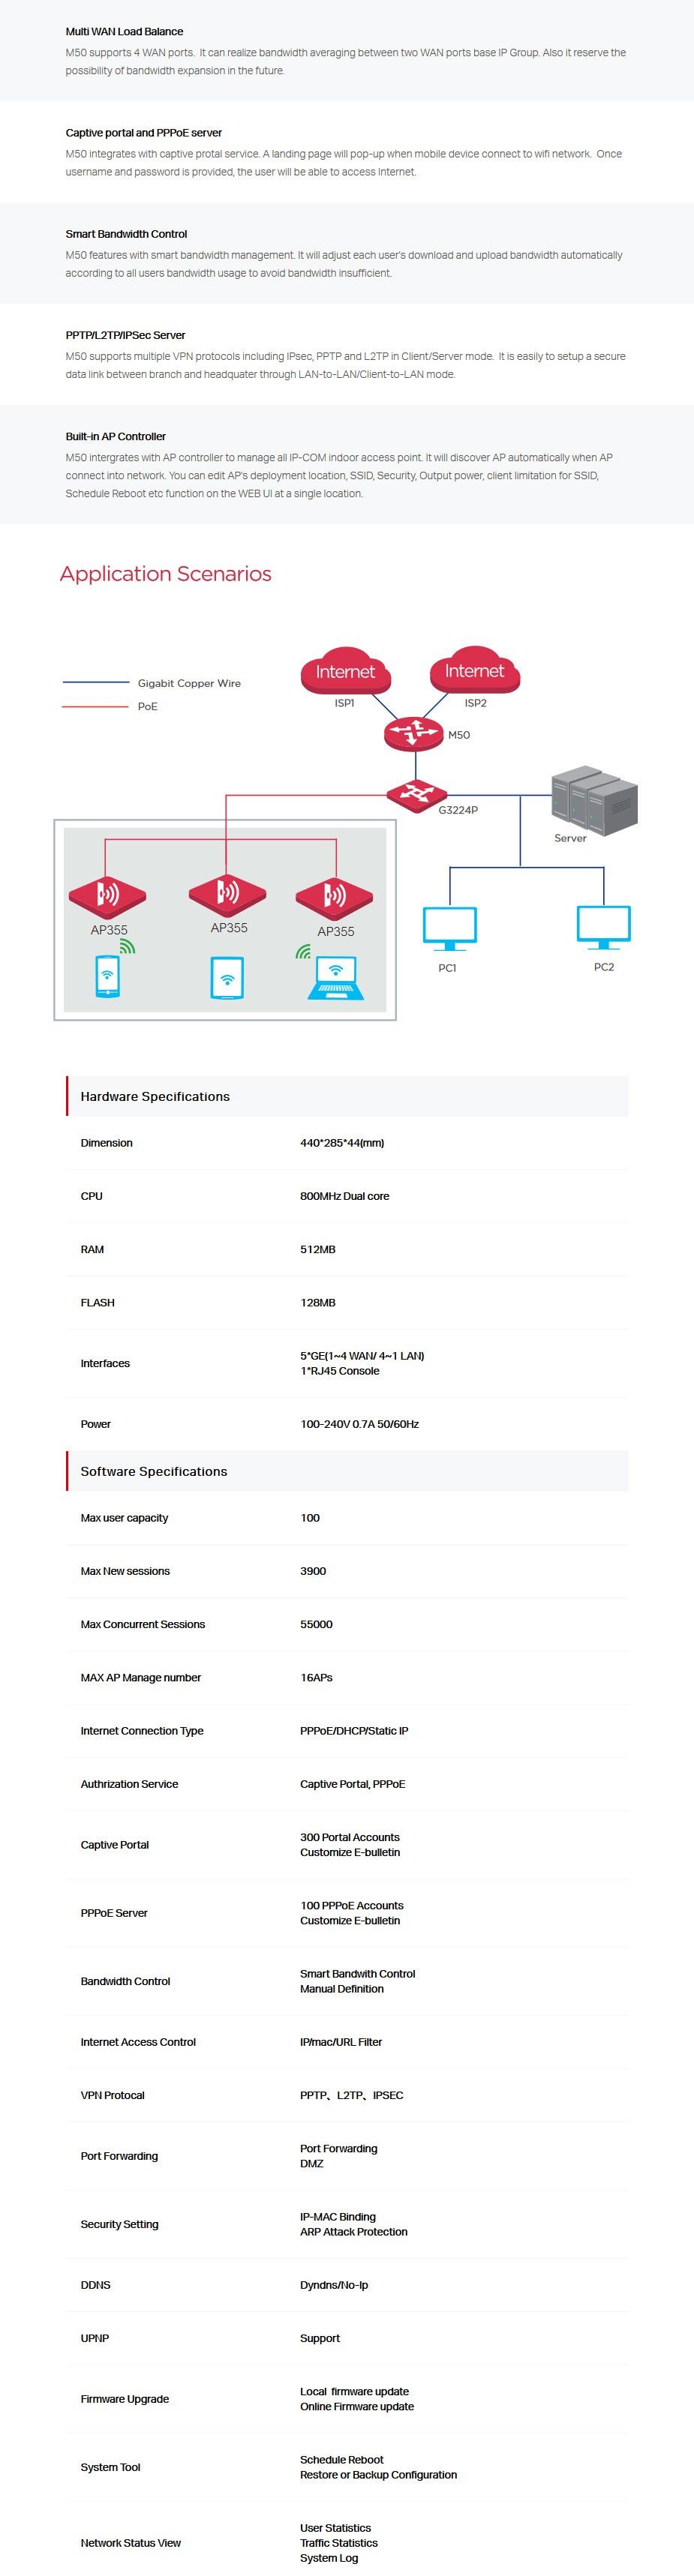 ipcom-m50-multiwan-hotspot-router-ac28677-5.jpg